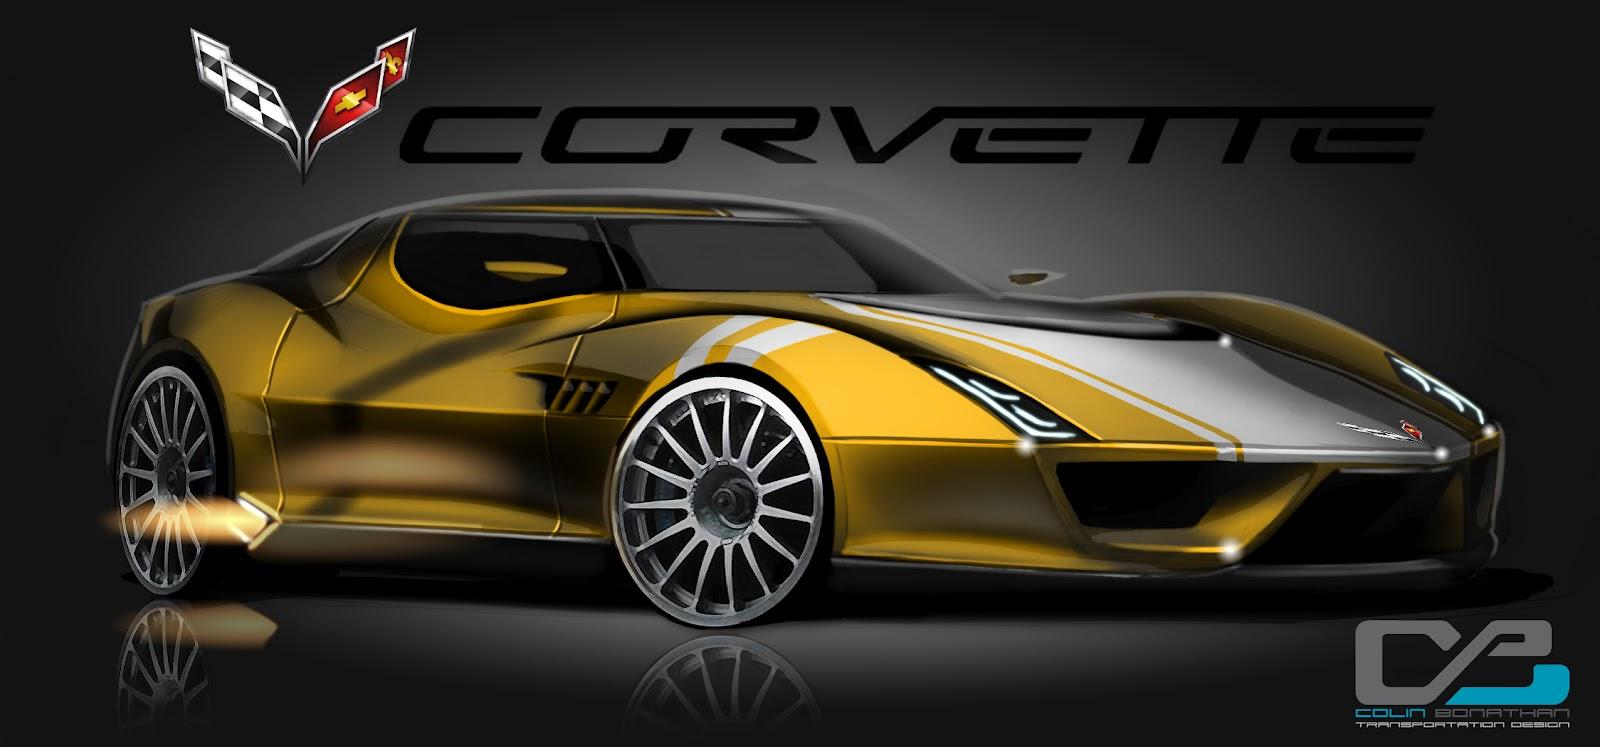 Corvets.html | Autos Post